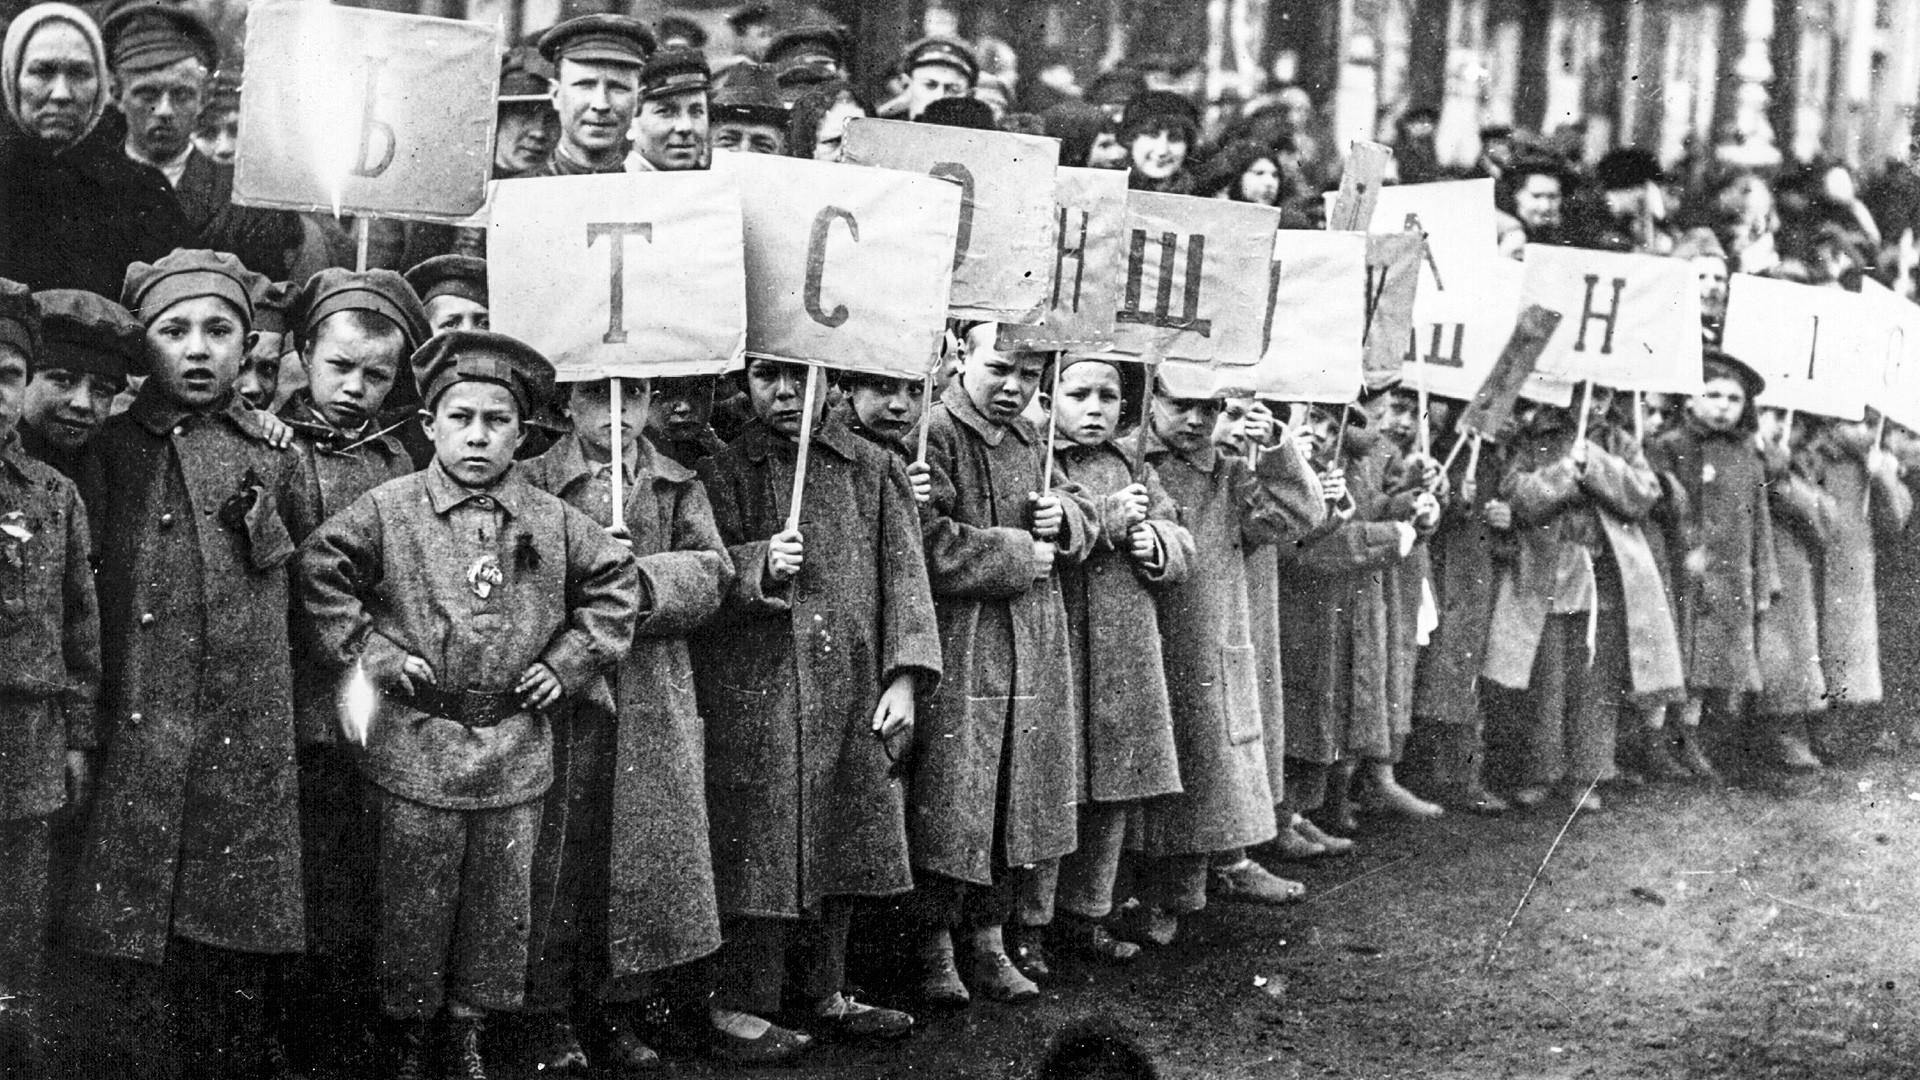 1 юни 1923 г., детска демонстрация в Москва